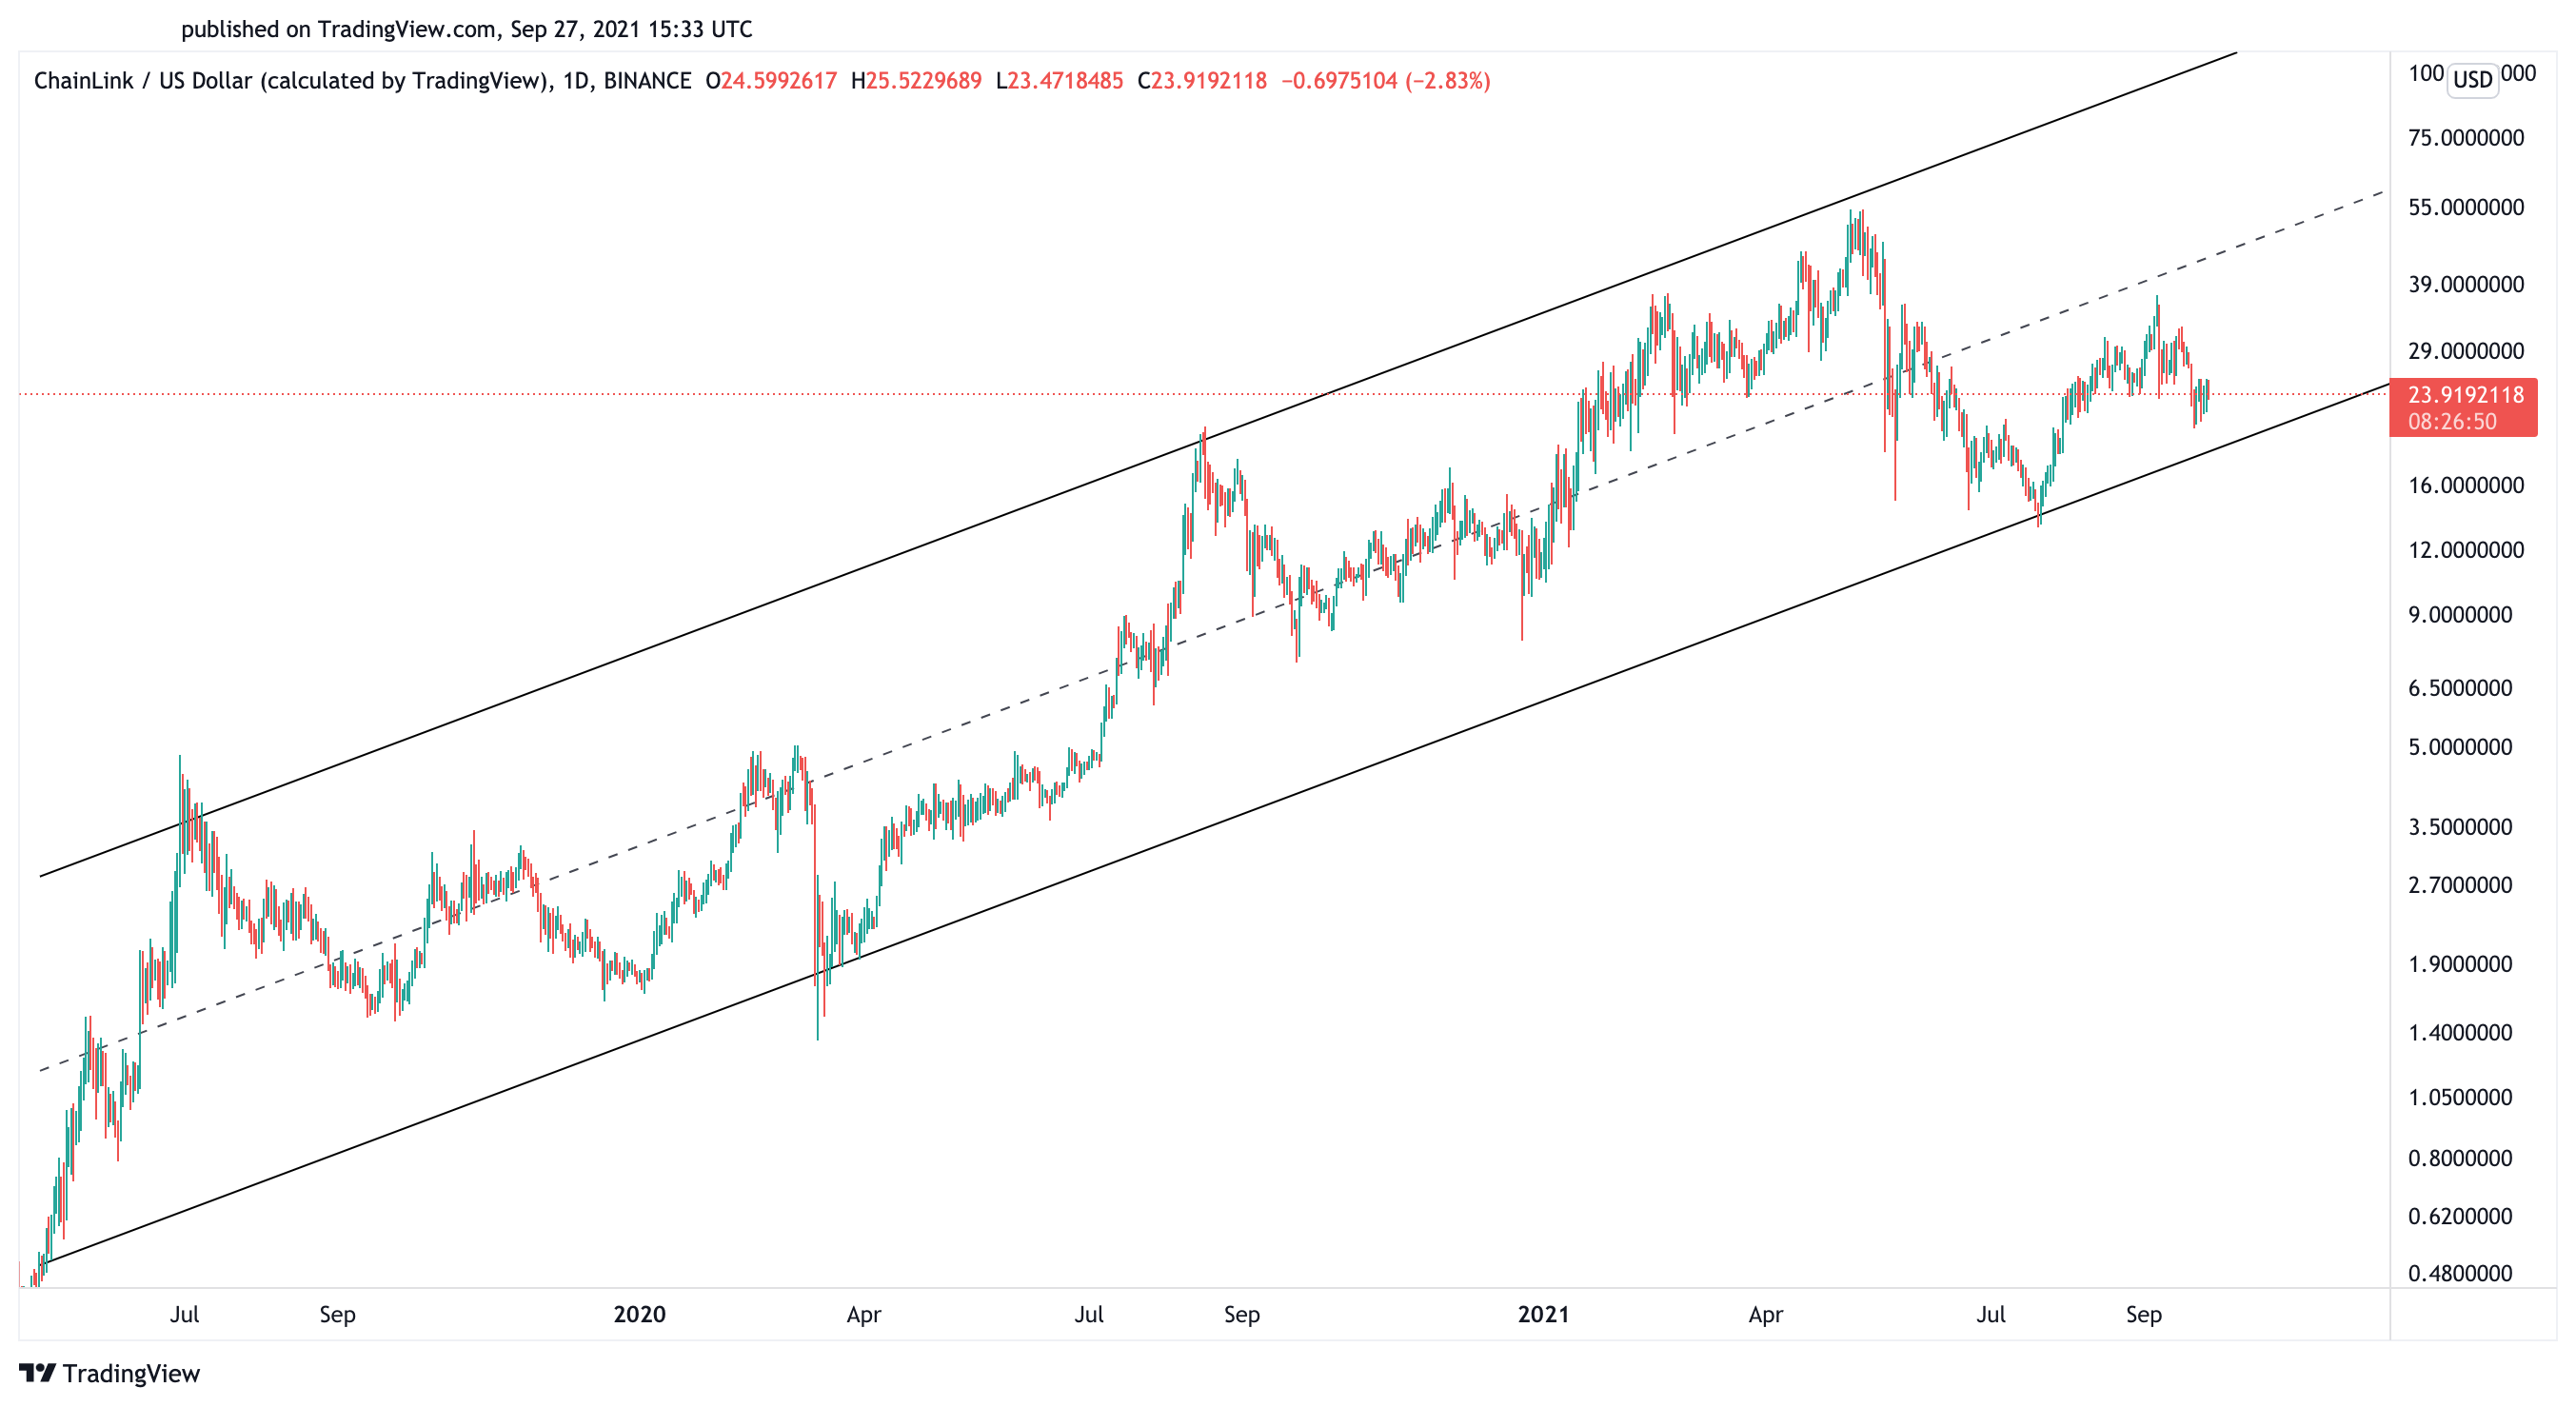 Chainlink US dollar price chart